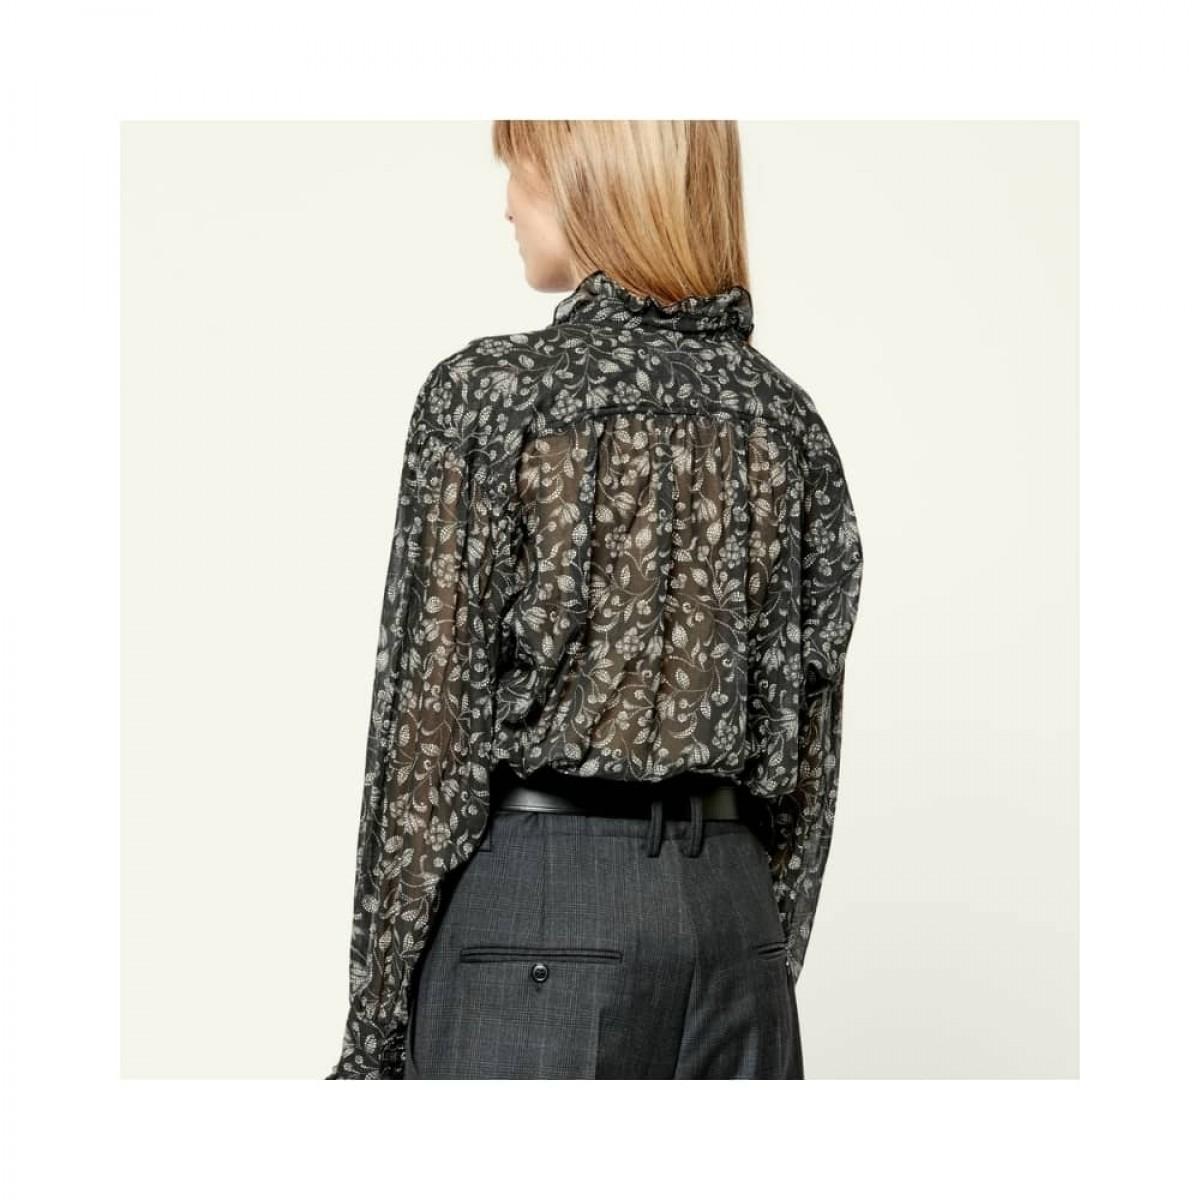 pamias skjorte - black -model ryg